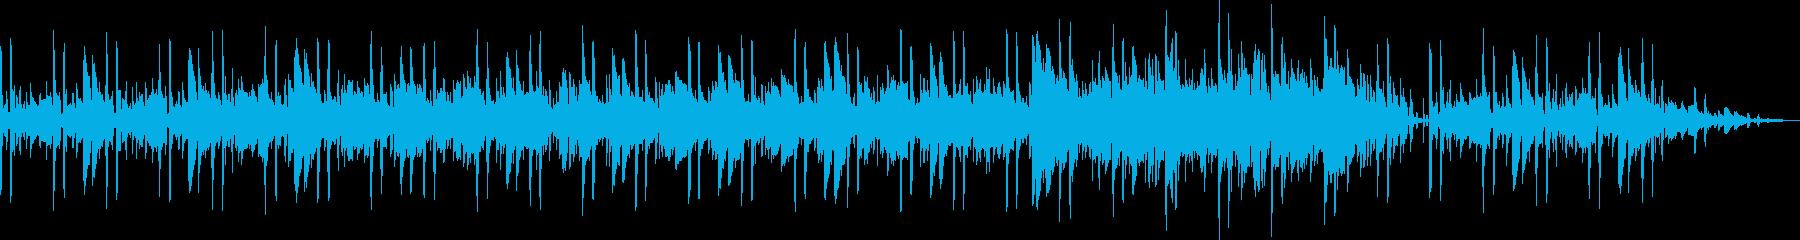 BGM素材(ムーディー、リラックス)の再生済みの波形